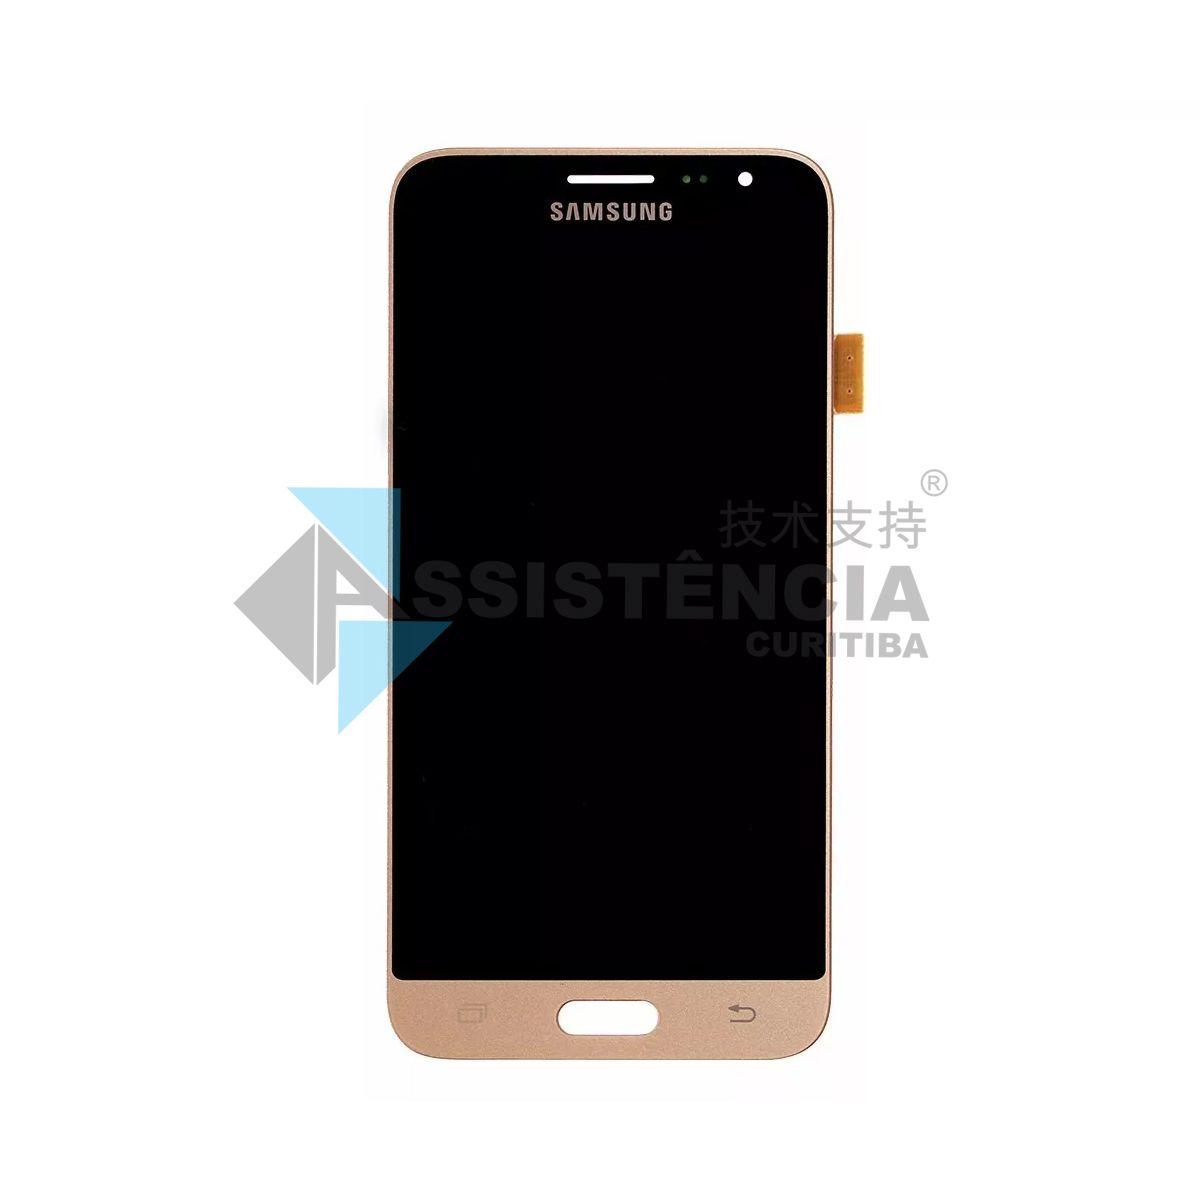 Tela Display Samsung Galaxy J3 J320 Sm-J320 2016 / J300 Sm-J300 Com Brilho Dourado